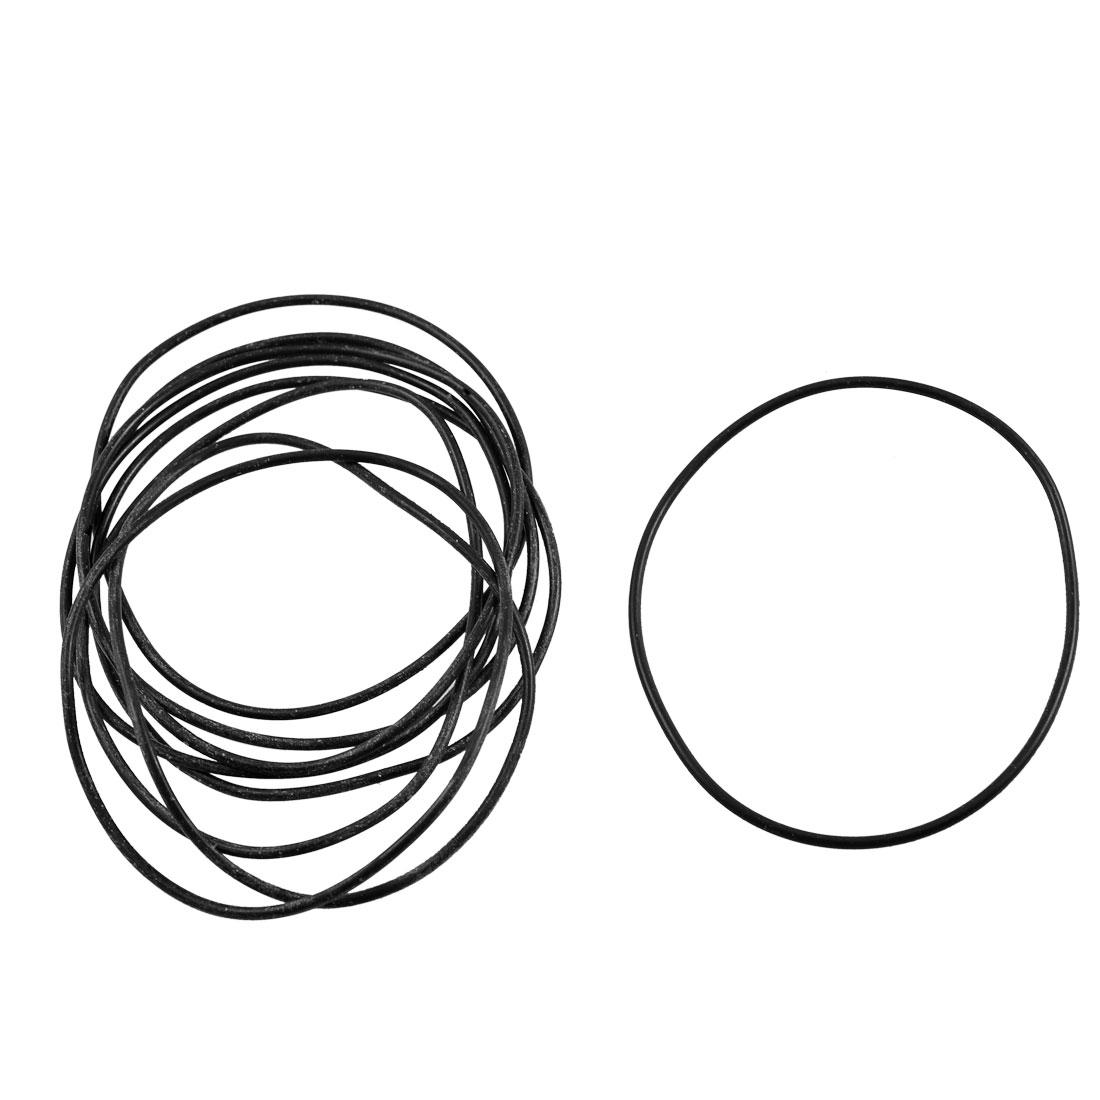 10 Pcs 68.6mm x 65mm x 1.8mm Black Rubber O Ring Oil Sealing Gaskets